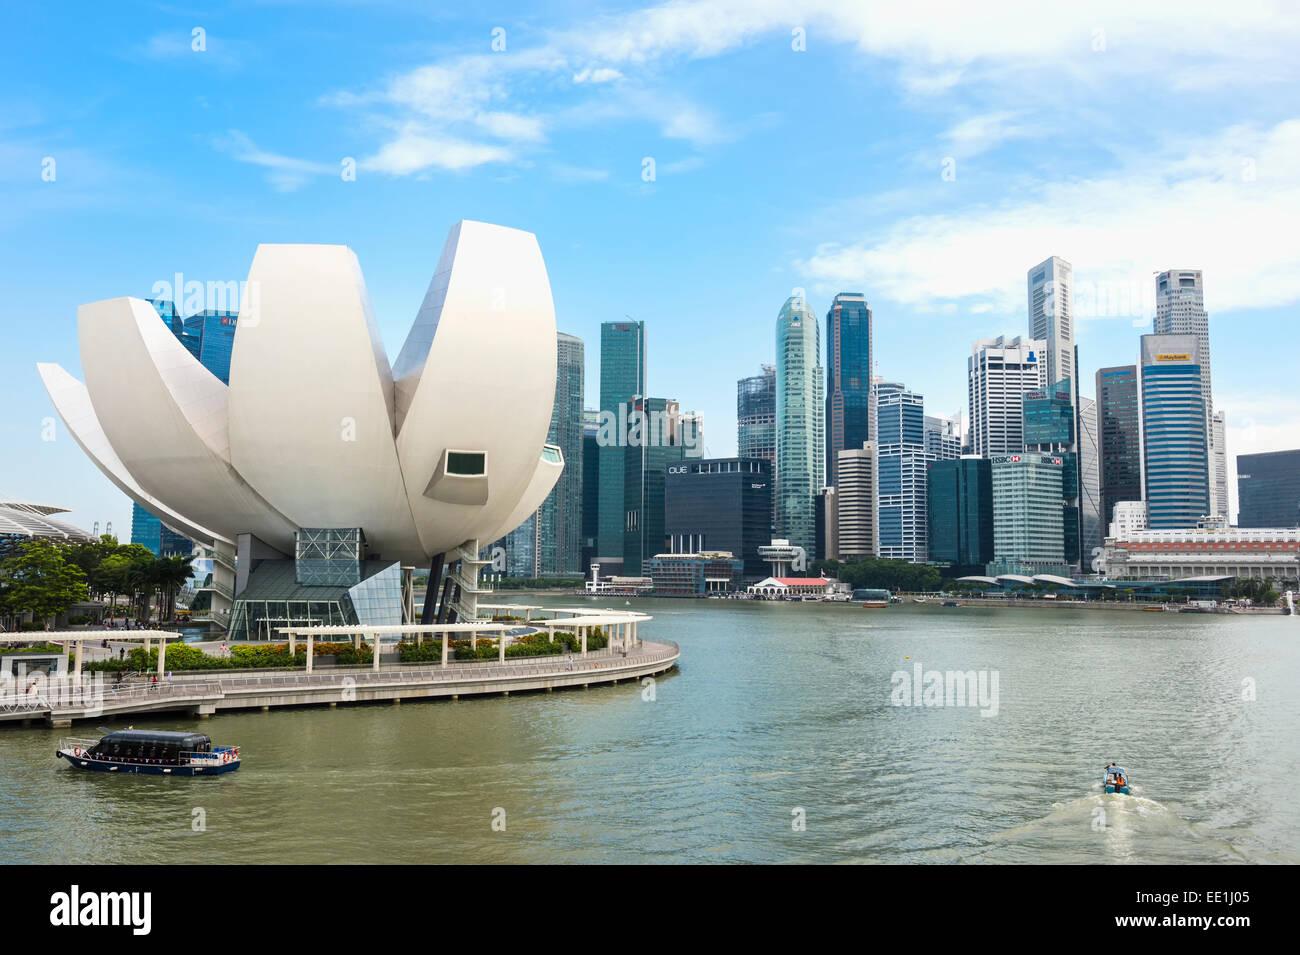 Science Museum and Singapore skyline, Singapore, Southeast Asia, Asia - Stock Image